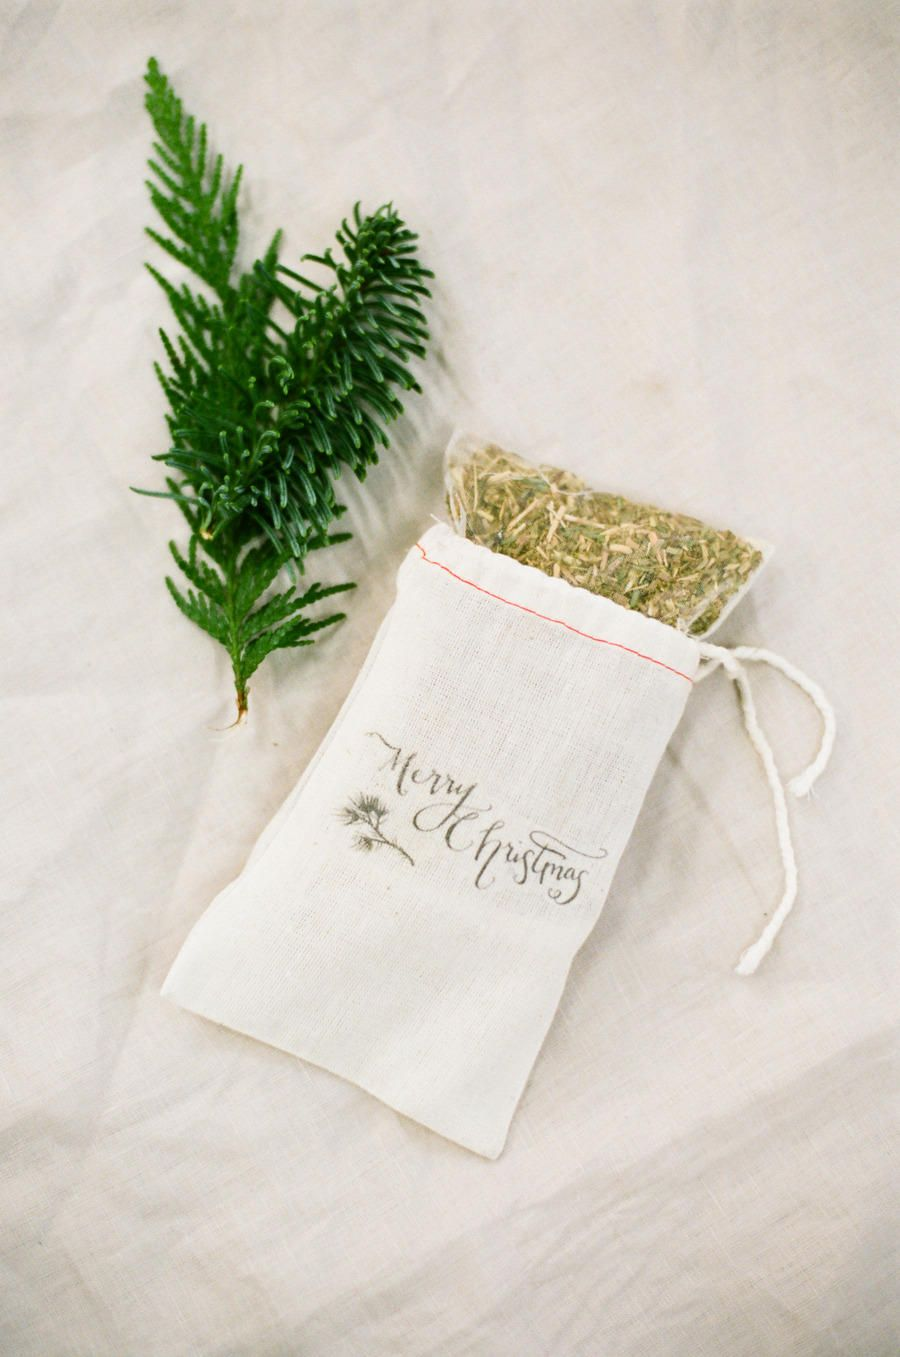 Christmas Wedding Favours...Christmas tea | Wedding stuffs ...